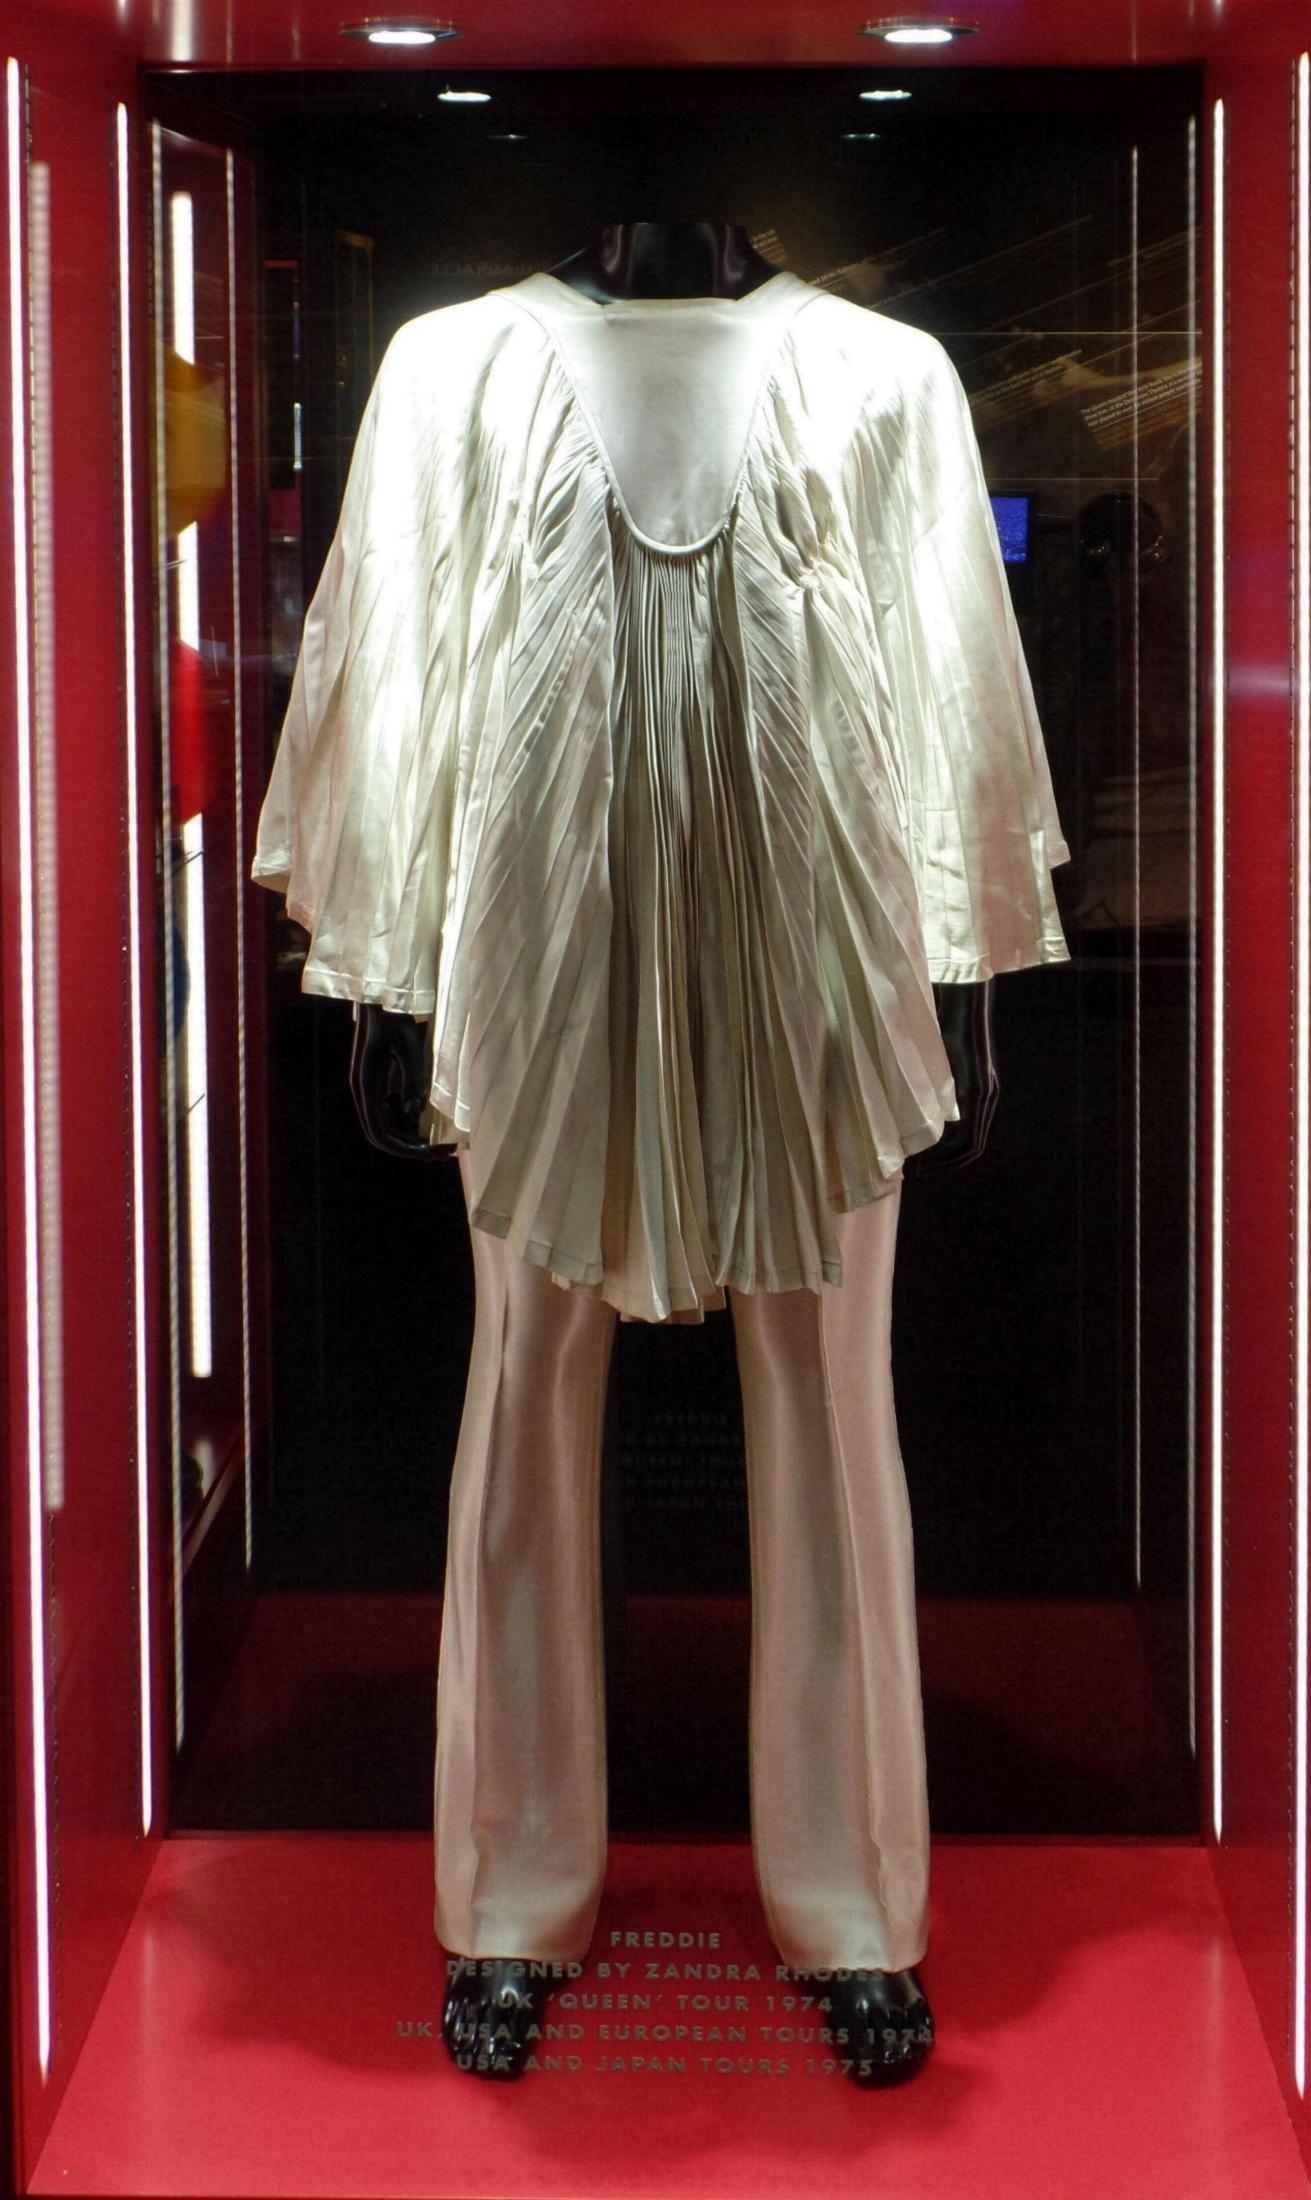 Exhibition Stand Lighting Equipment : Queen quot the studio experience exhibition